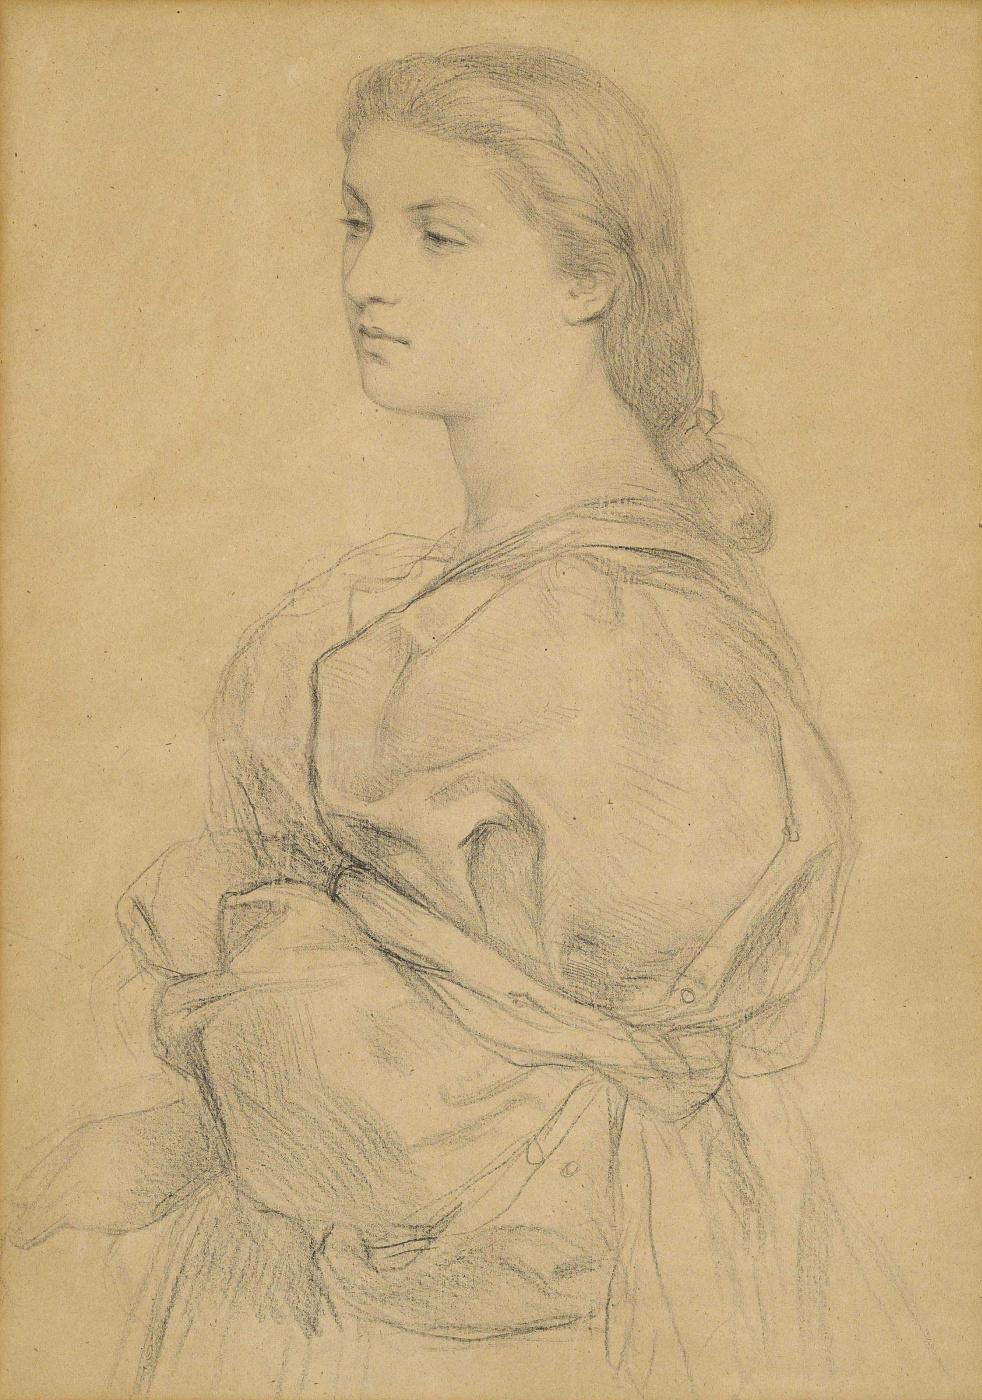 Frederick William Burton. Portrait of a young woman (Cassandra Fedele)